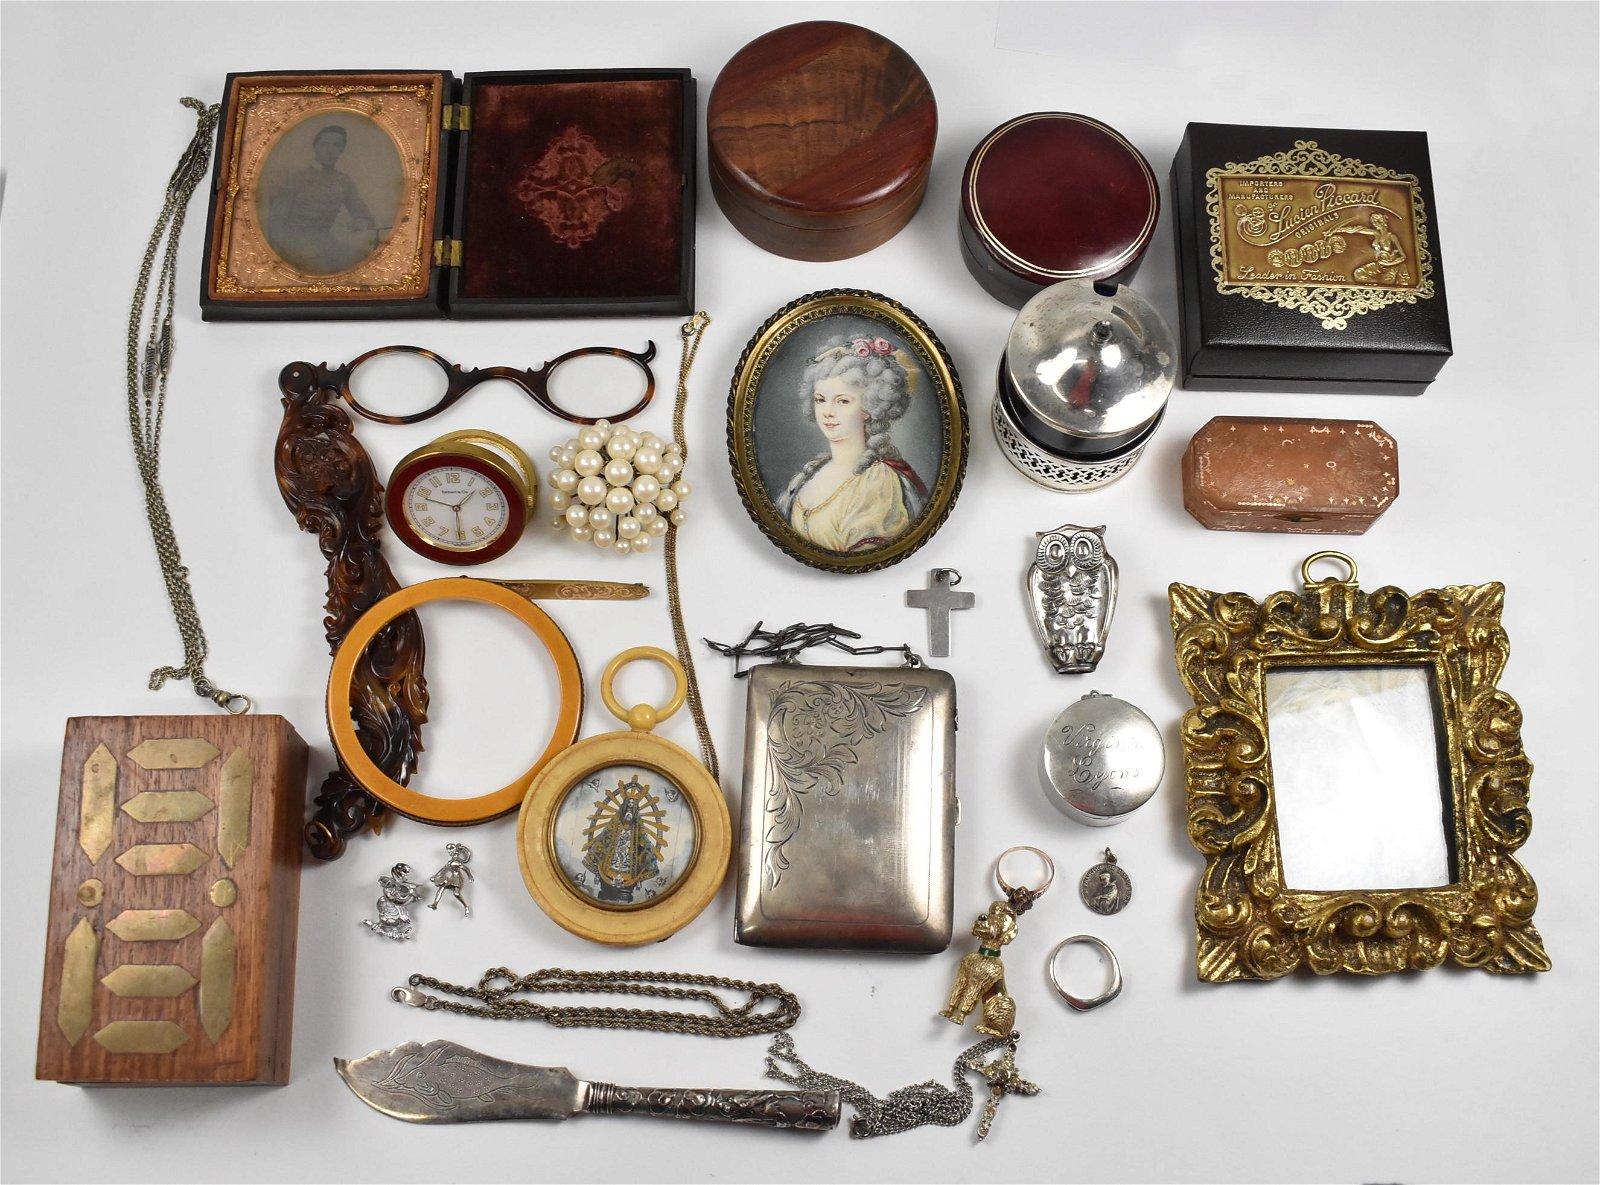 Tiffany Clock, Sterling, Vintage Jewelry, Portraits